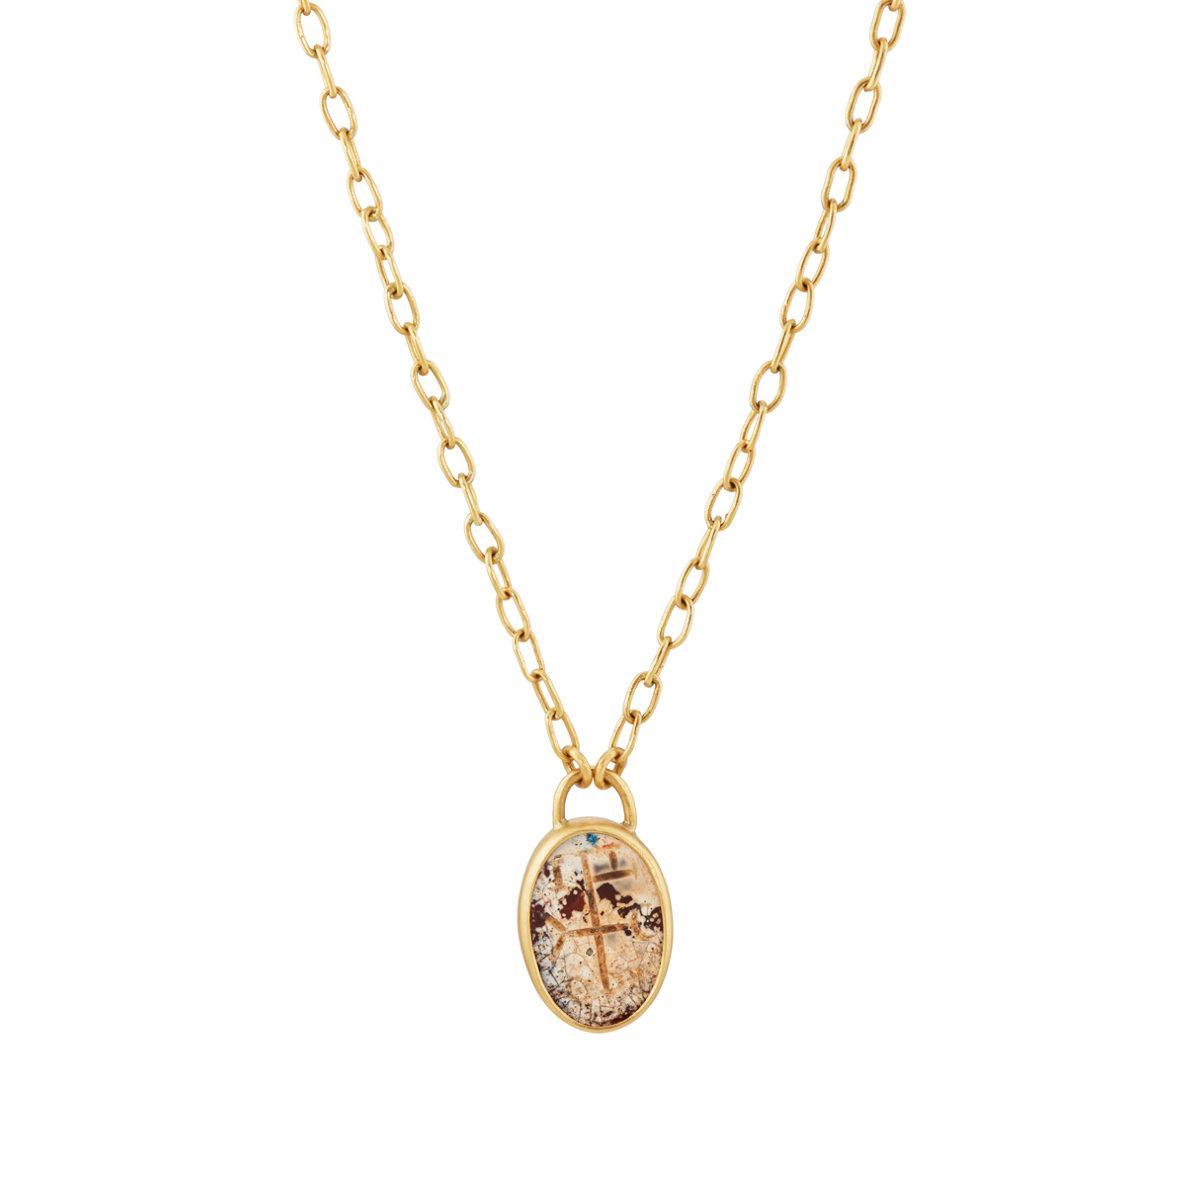 Eli Halili Womens Ancient Byzantine Carnelian Pendant Necklace cB0RpPN